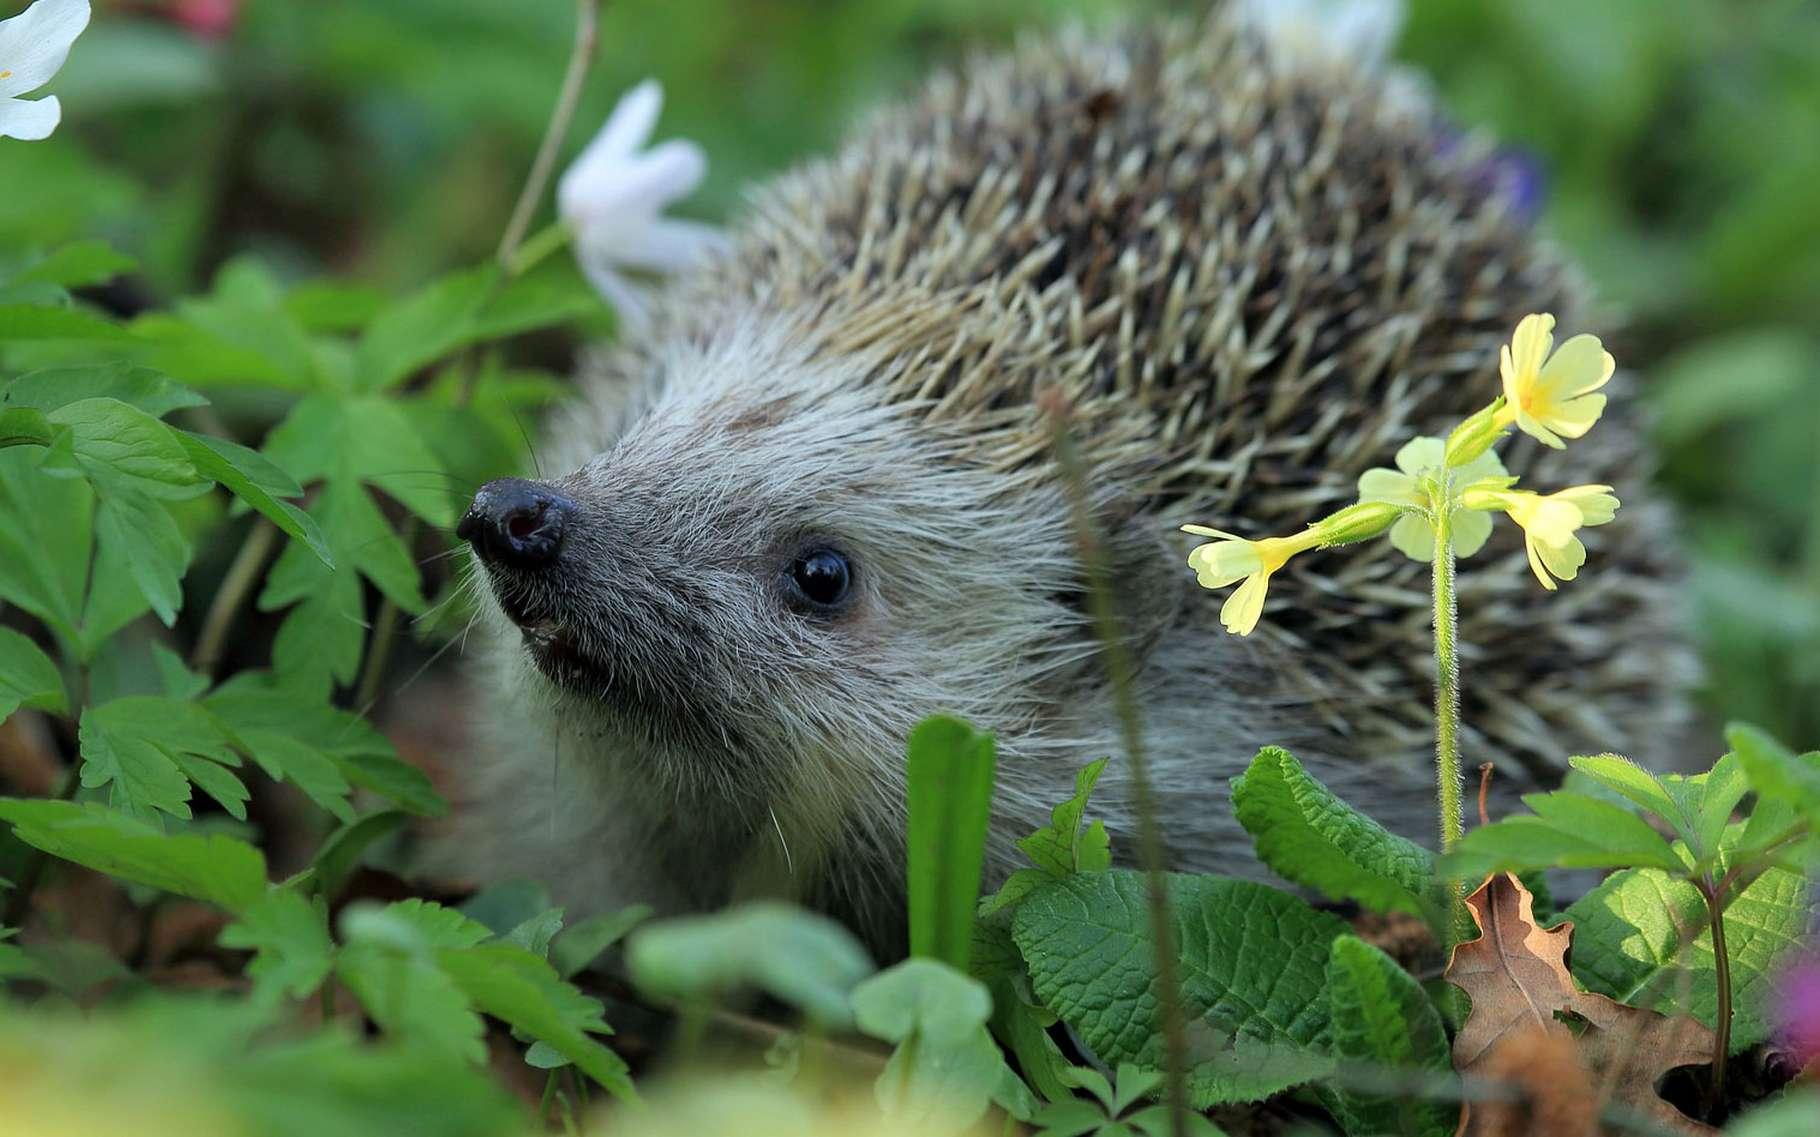 Le hérisson, l'ami du jardinier. © TomaszProszek, Pixabay, DP